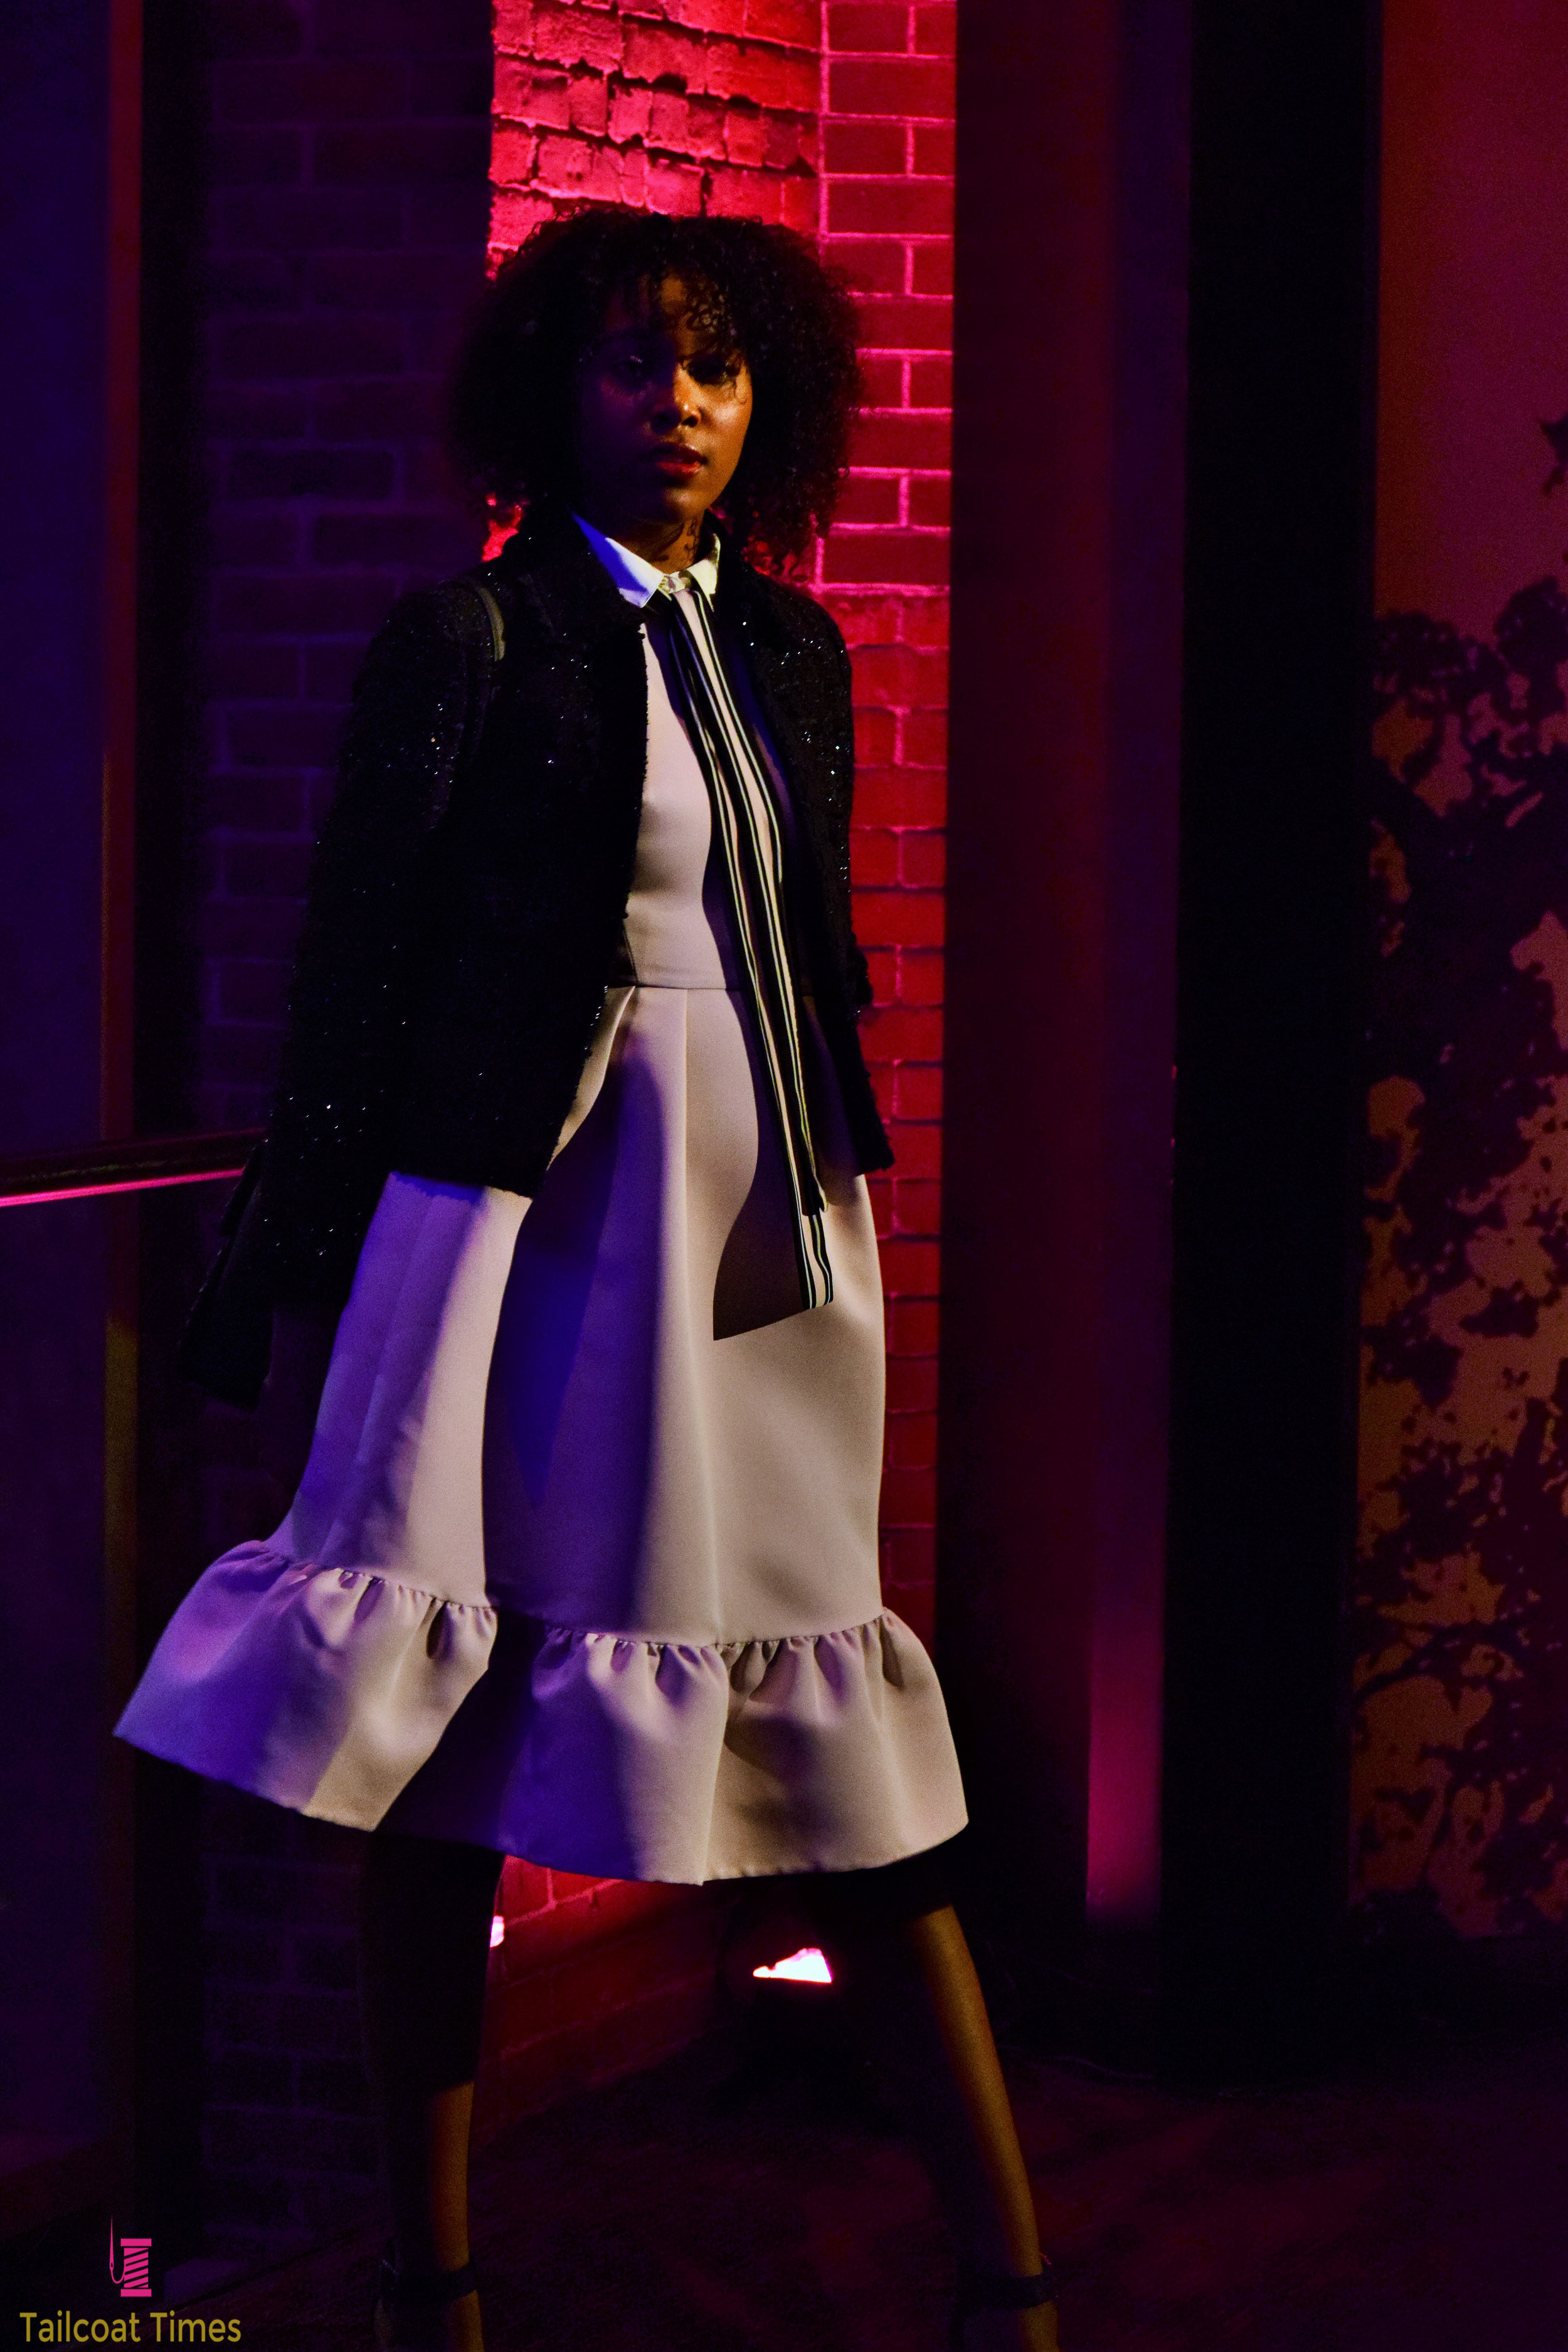 FashionablyLate_Kate Spade_Tailcoat Times (12 of 23).jpg